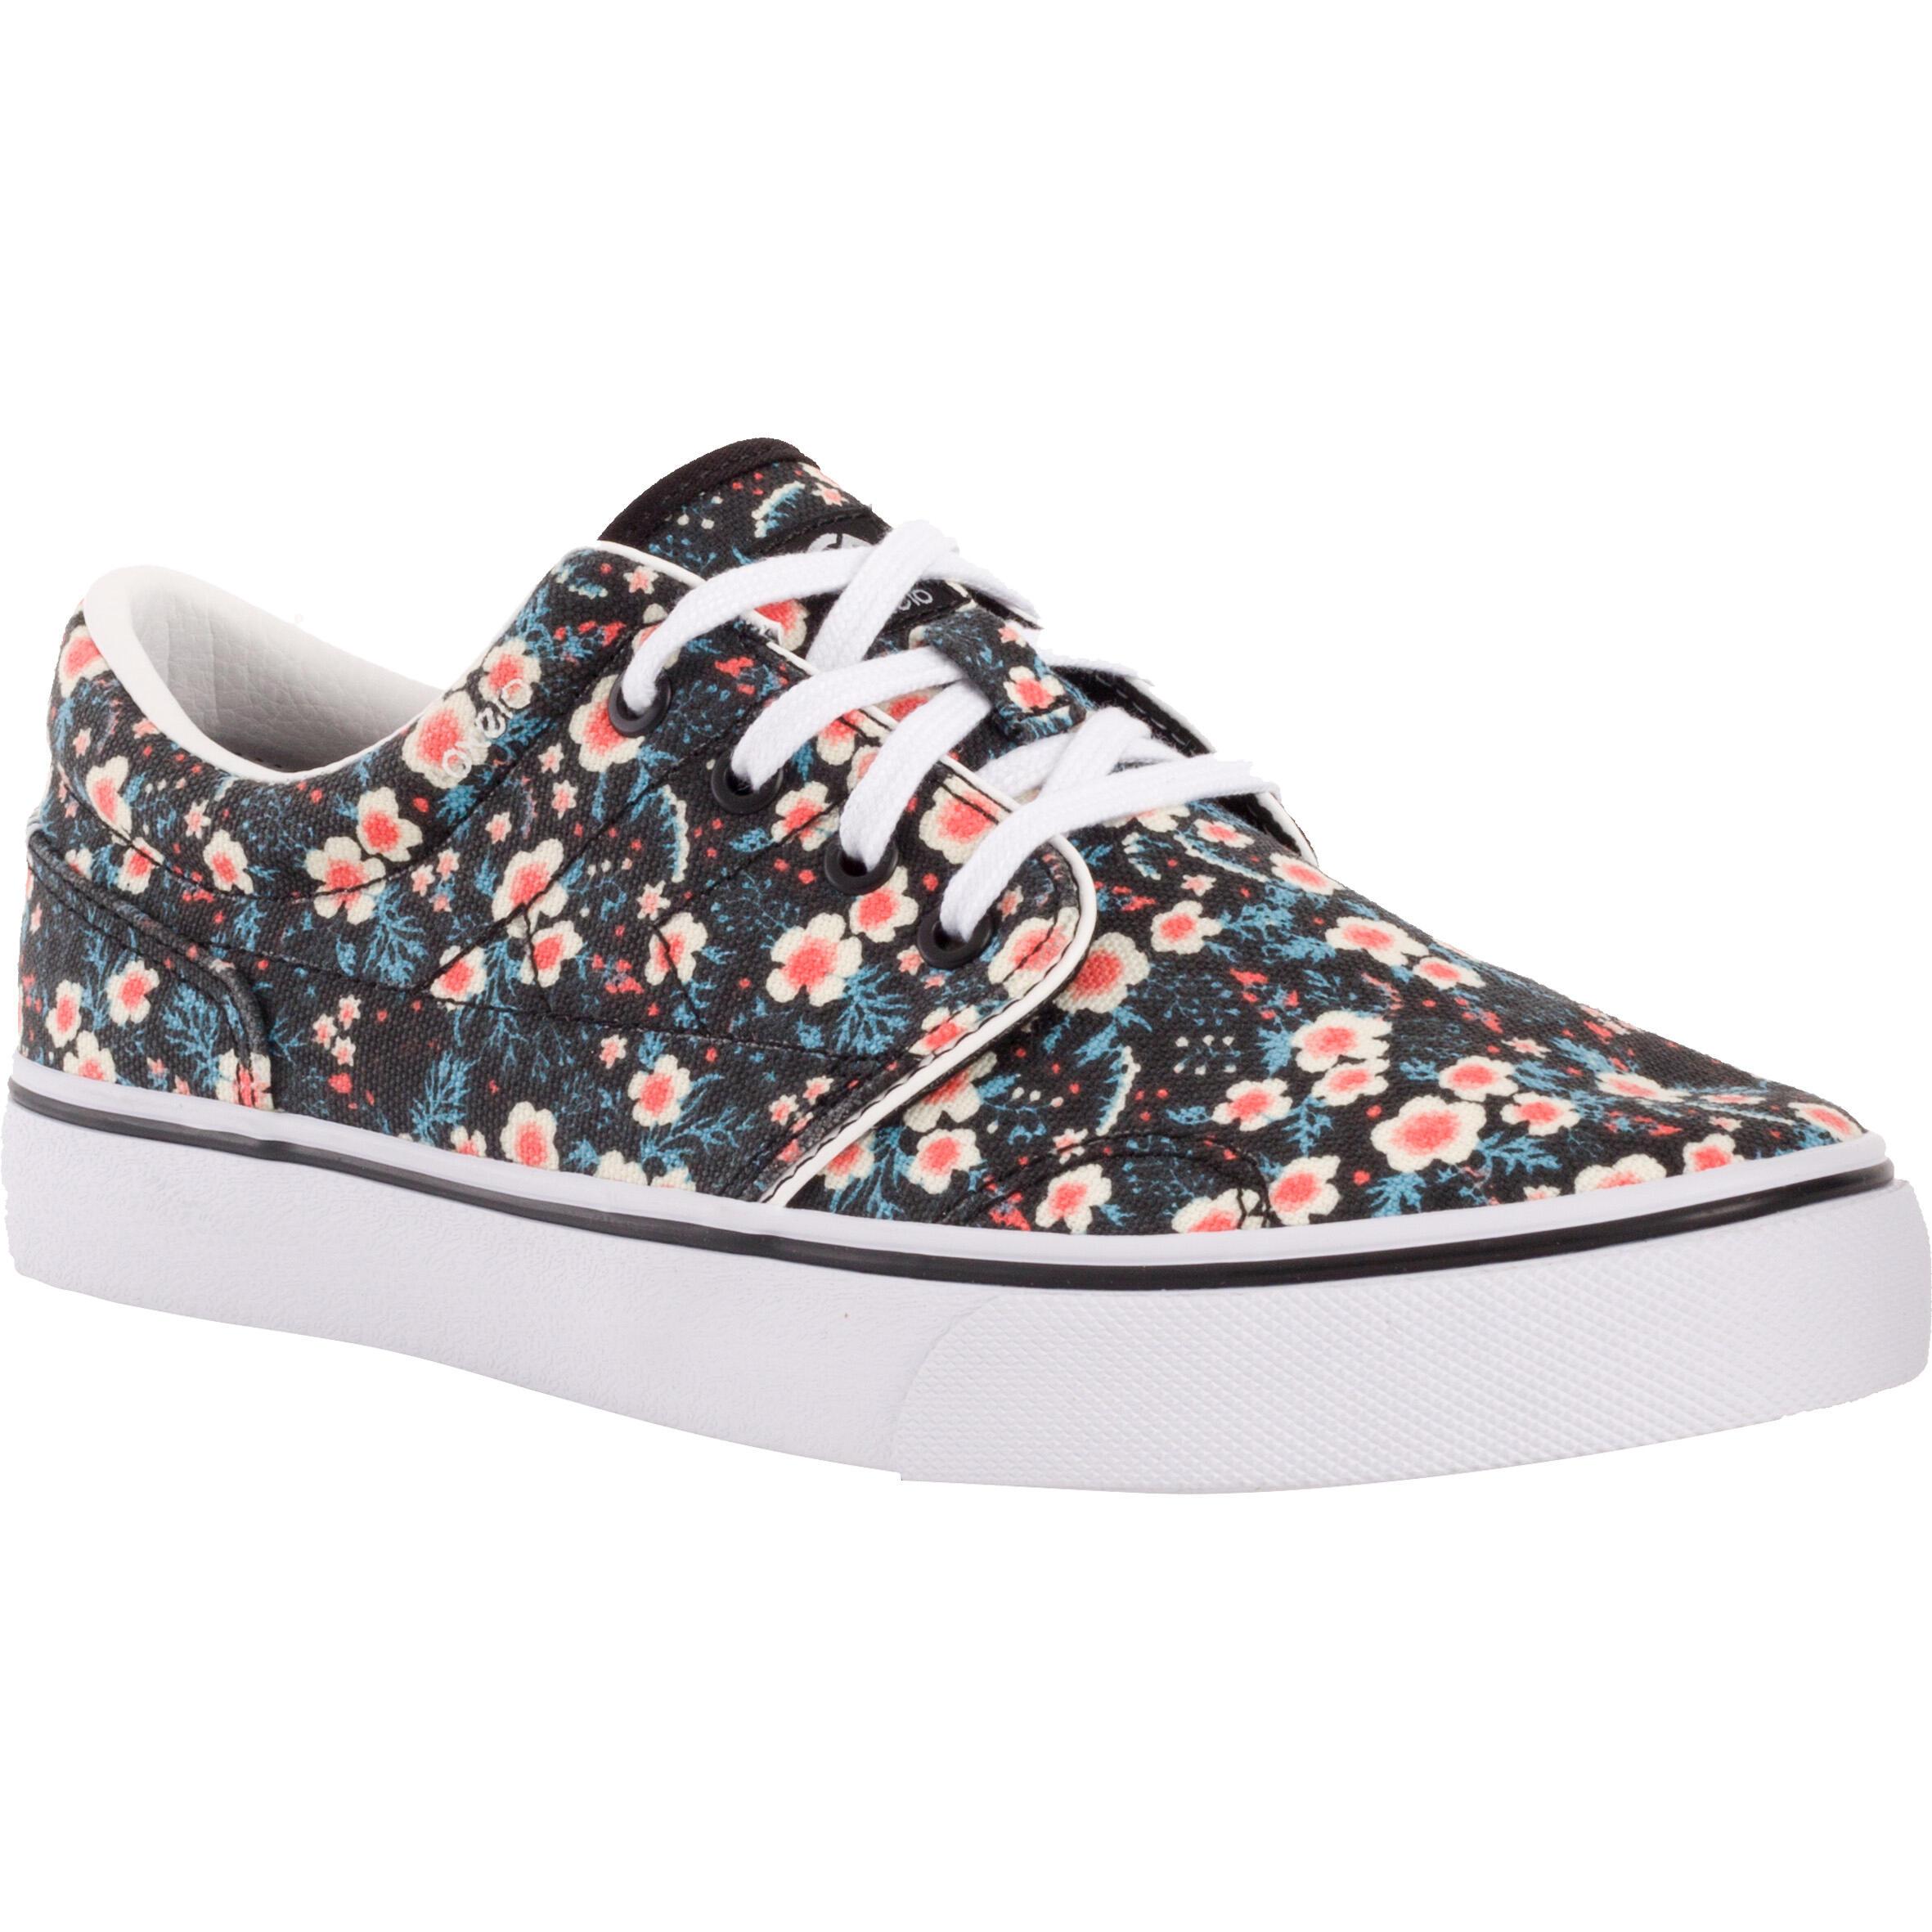 Oxelo Lage skateboard/longboardschoenen volwassenen Vulca 100 bloemen zwart